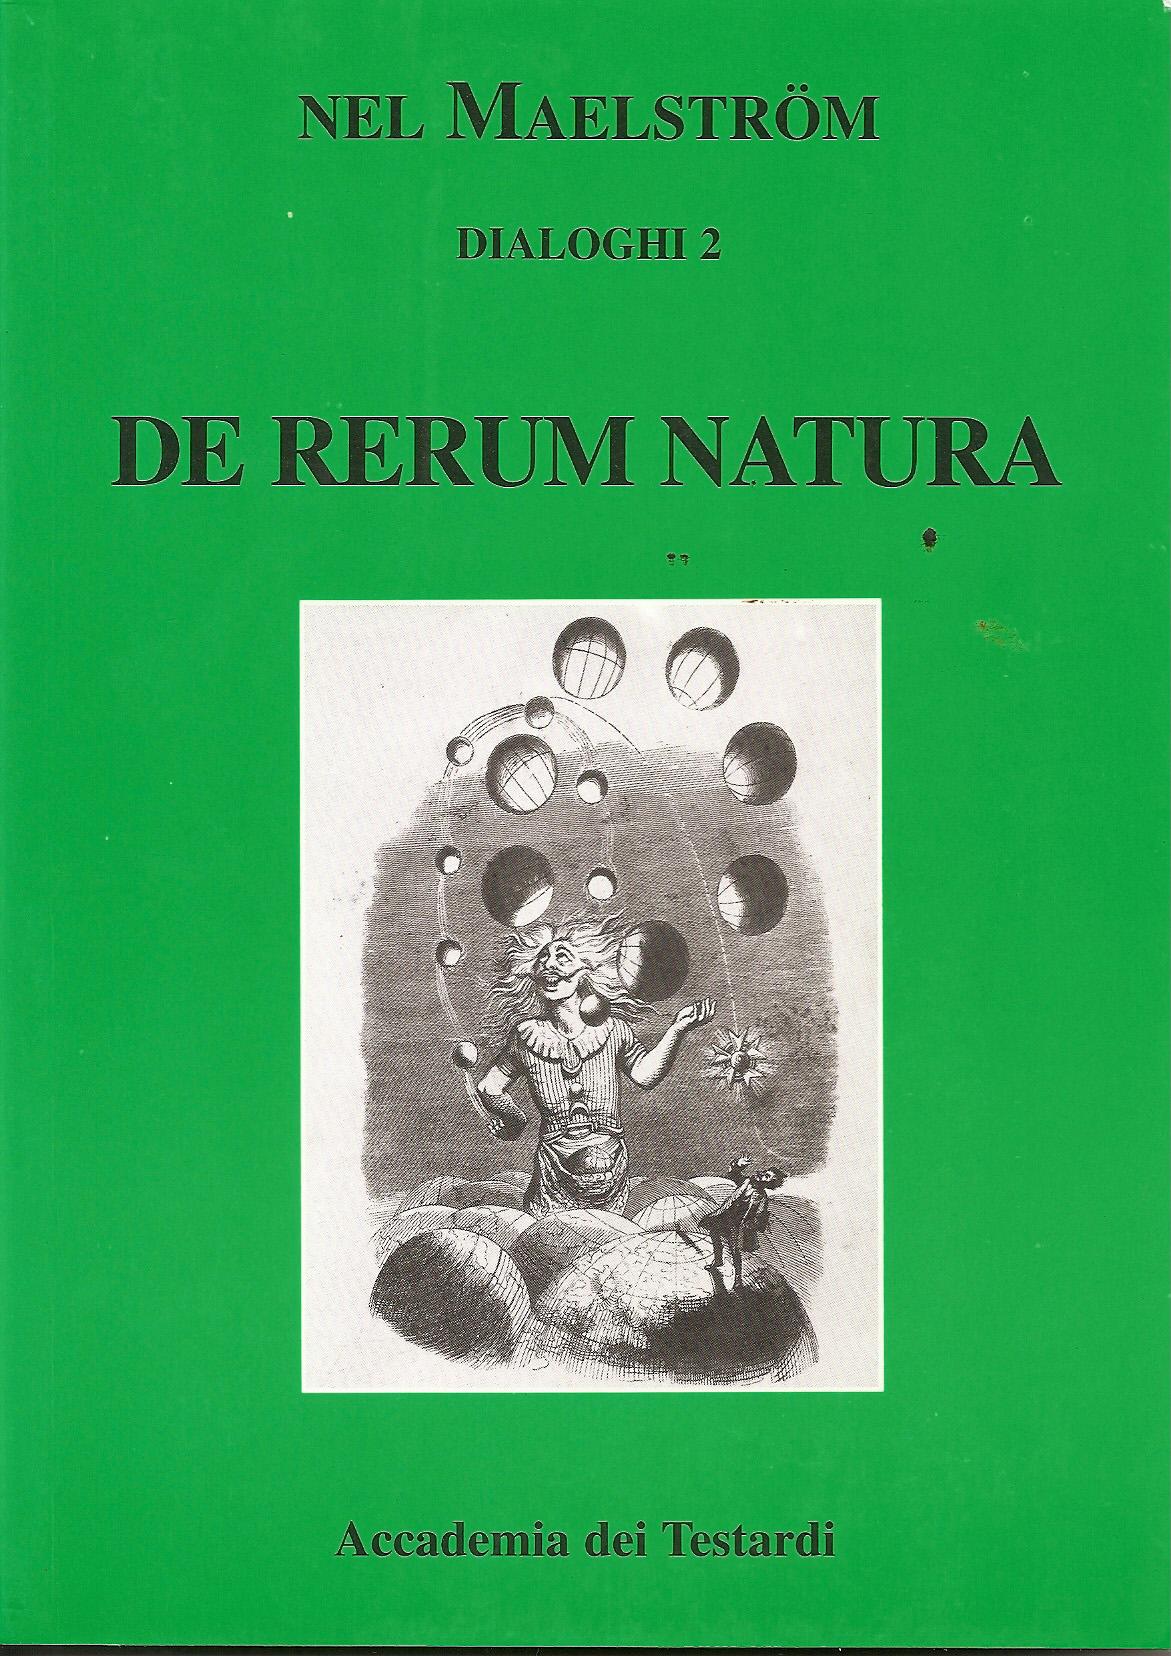 Nel maelstrom, dialoghi 2 De rerum natura